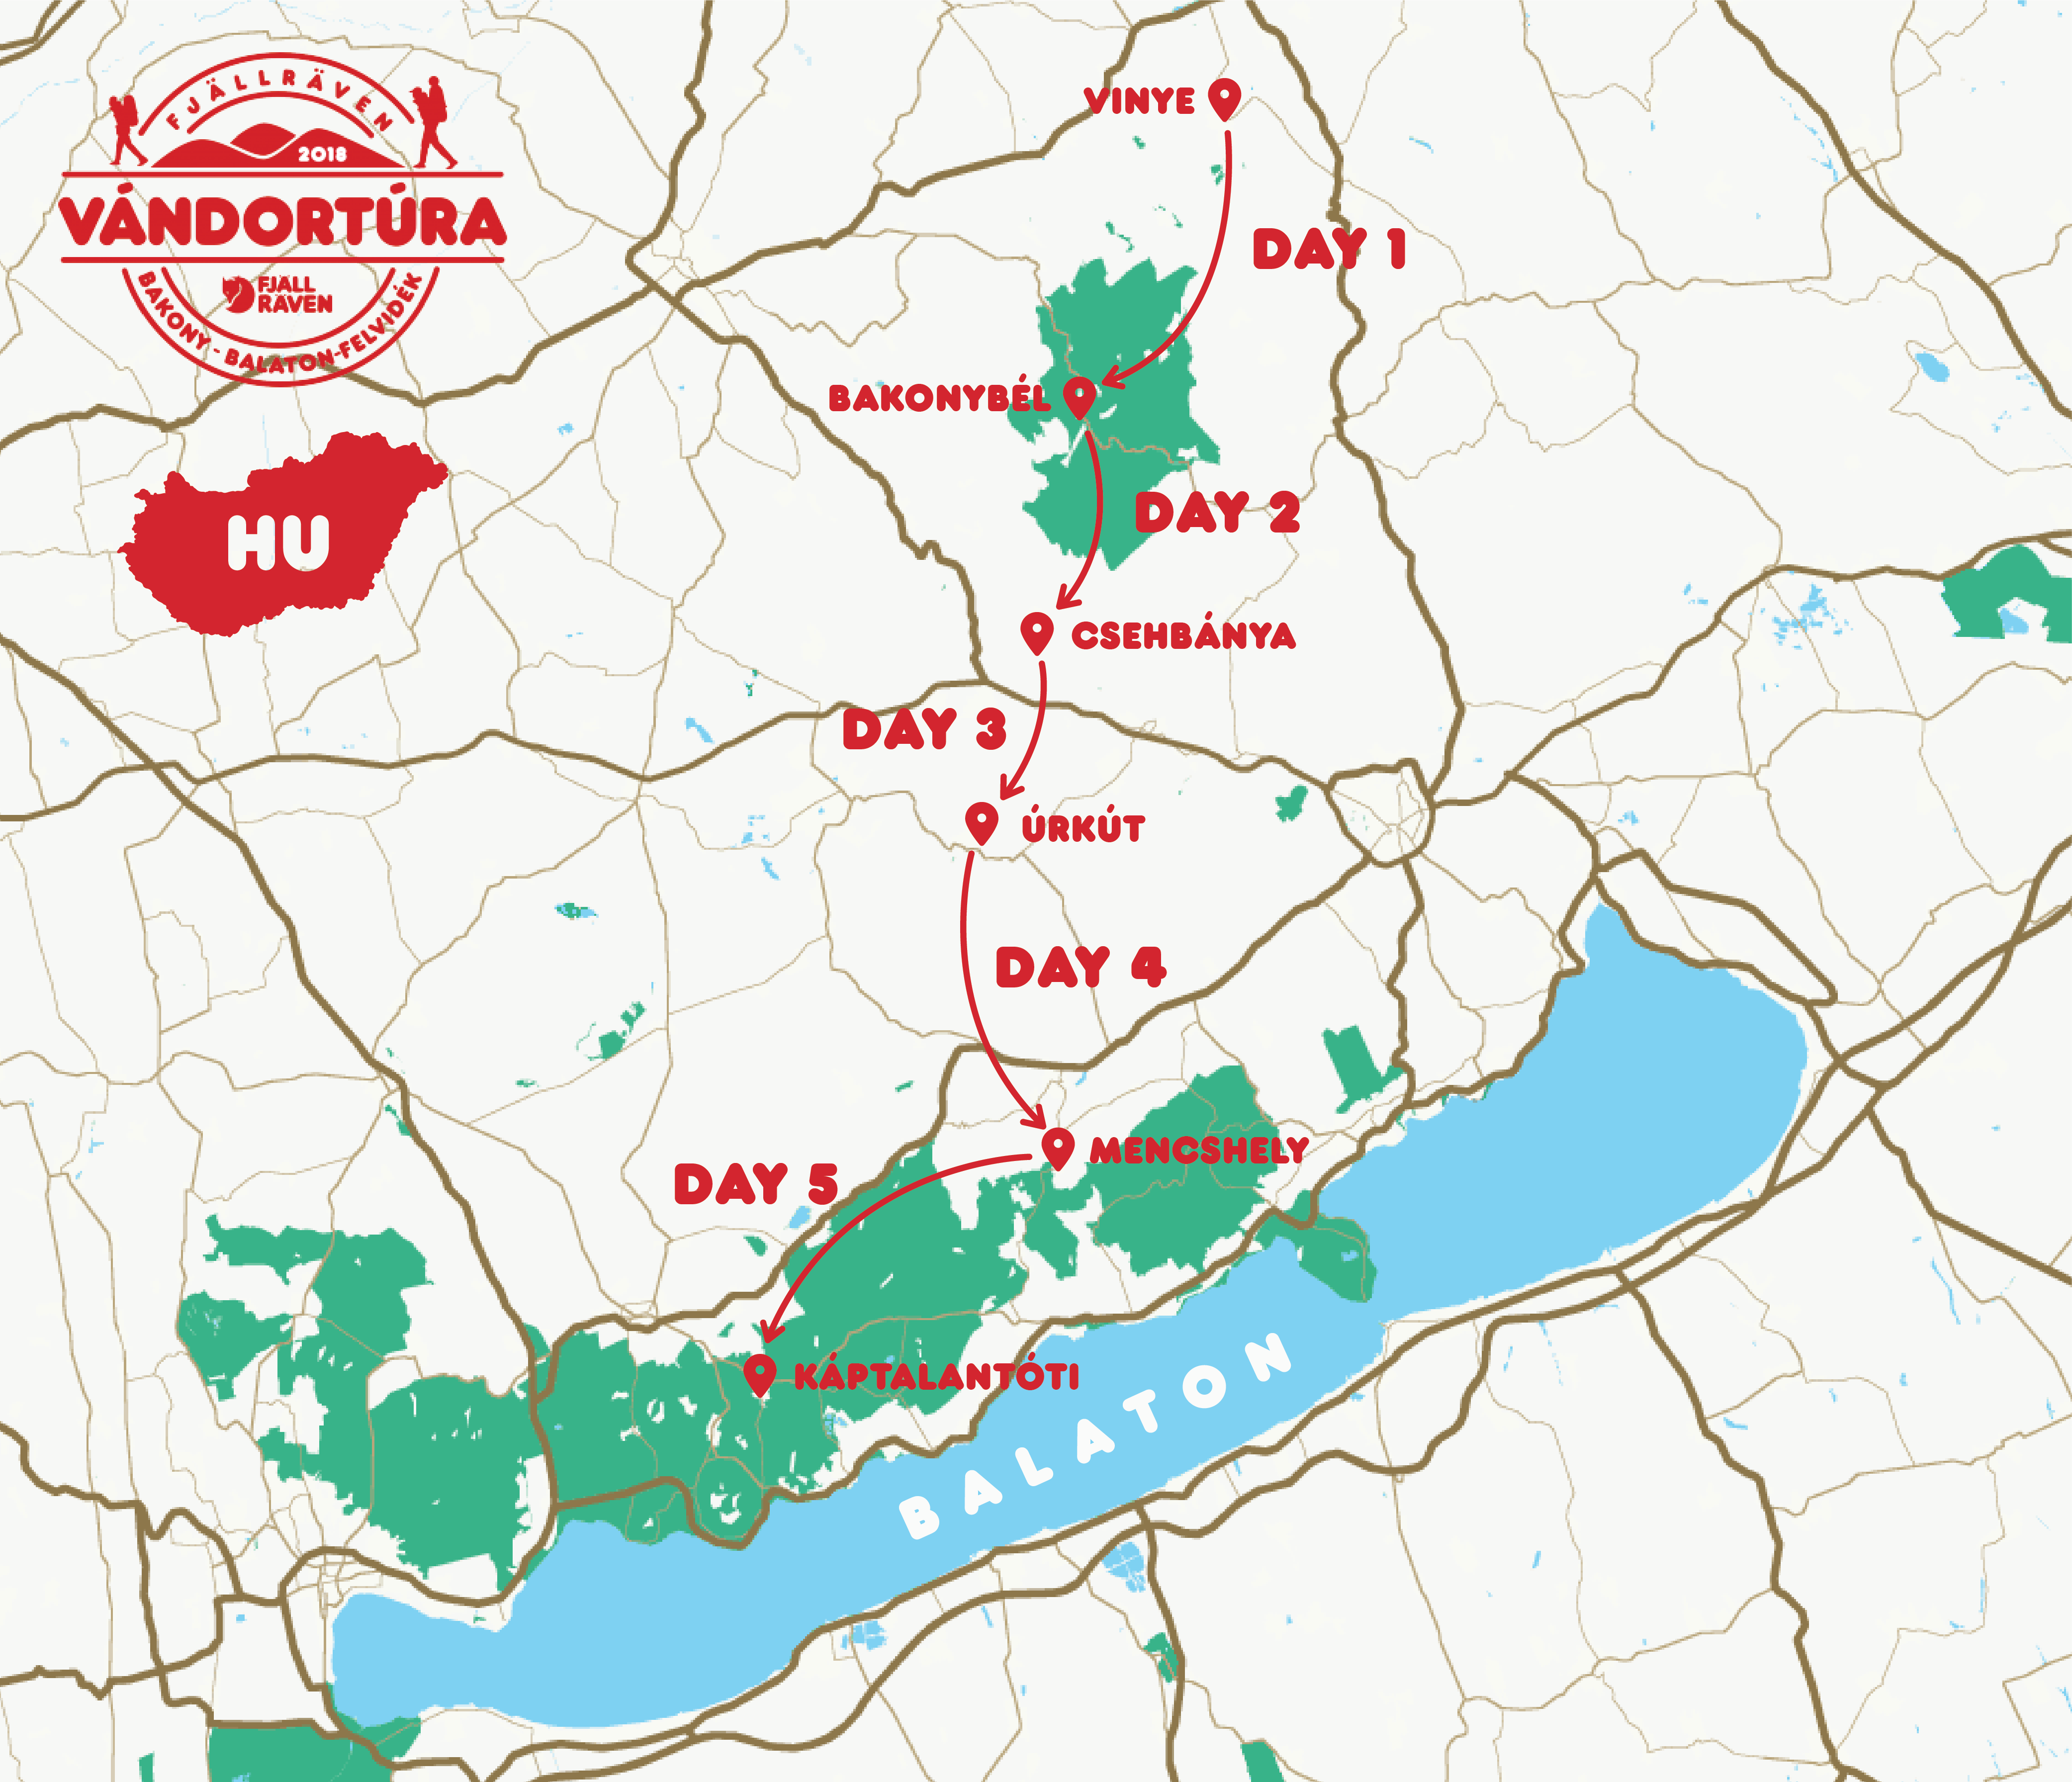 Fjallraven_Vandortura_Map.png (659 KB)